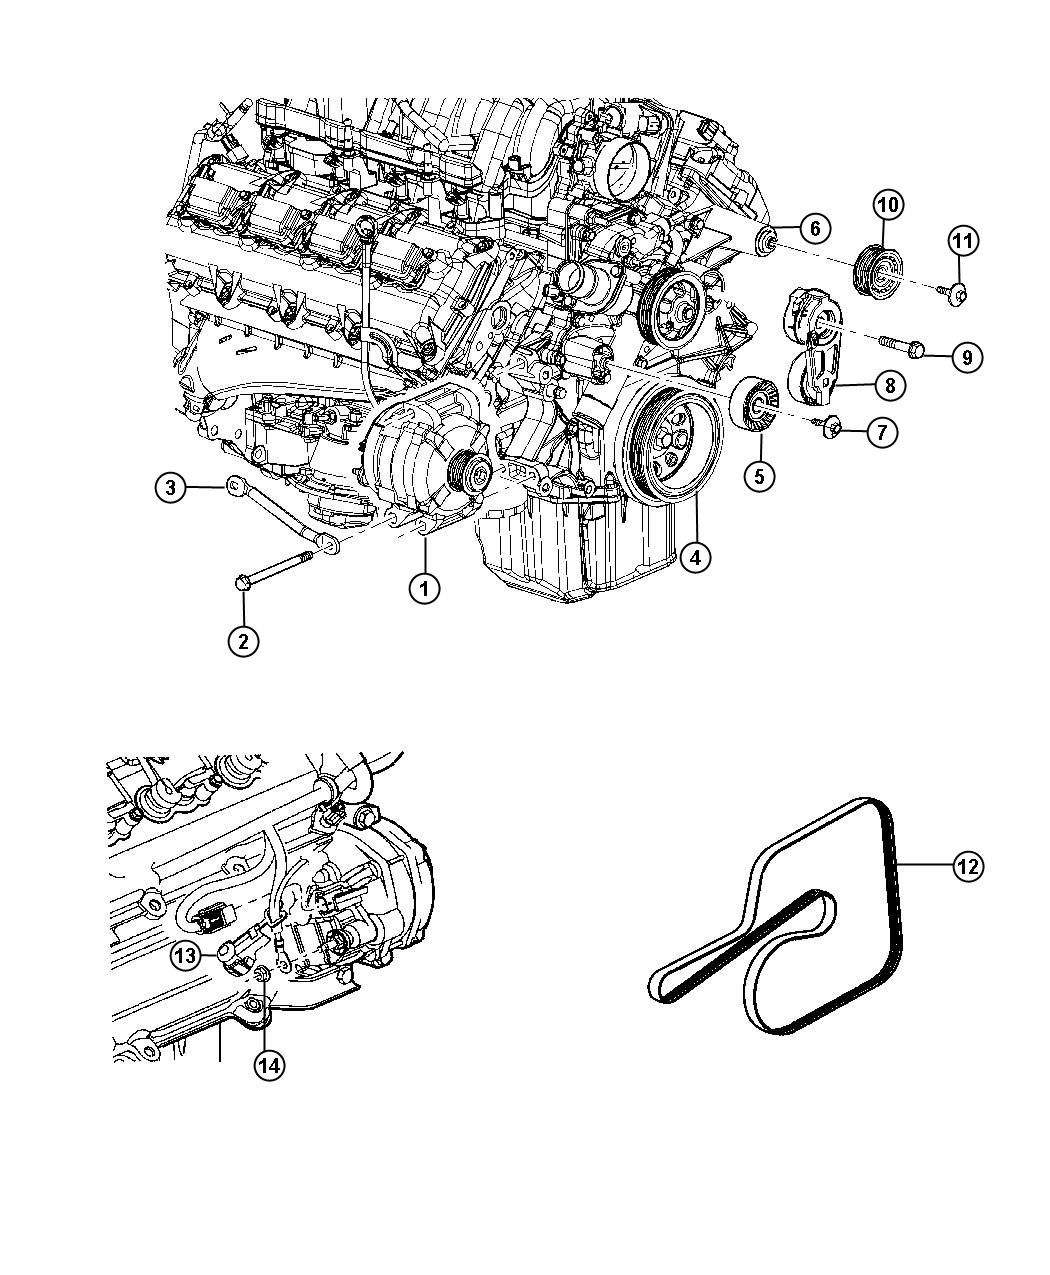 Chrysler 300 Generator. Remanufactured. Engine